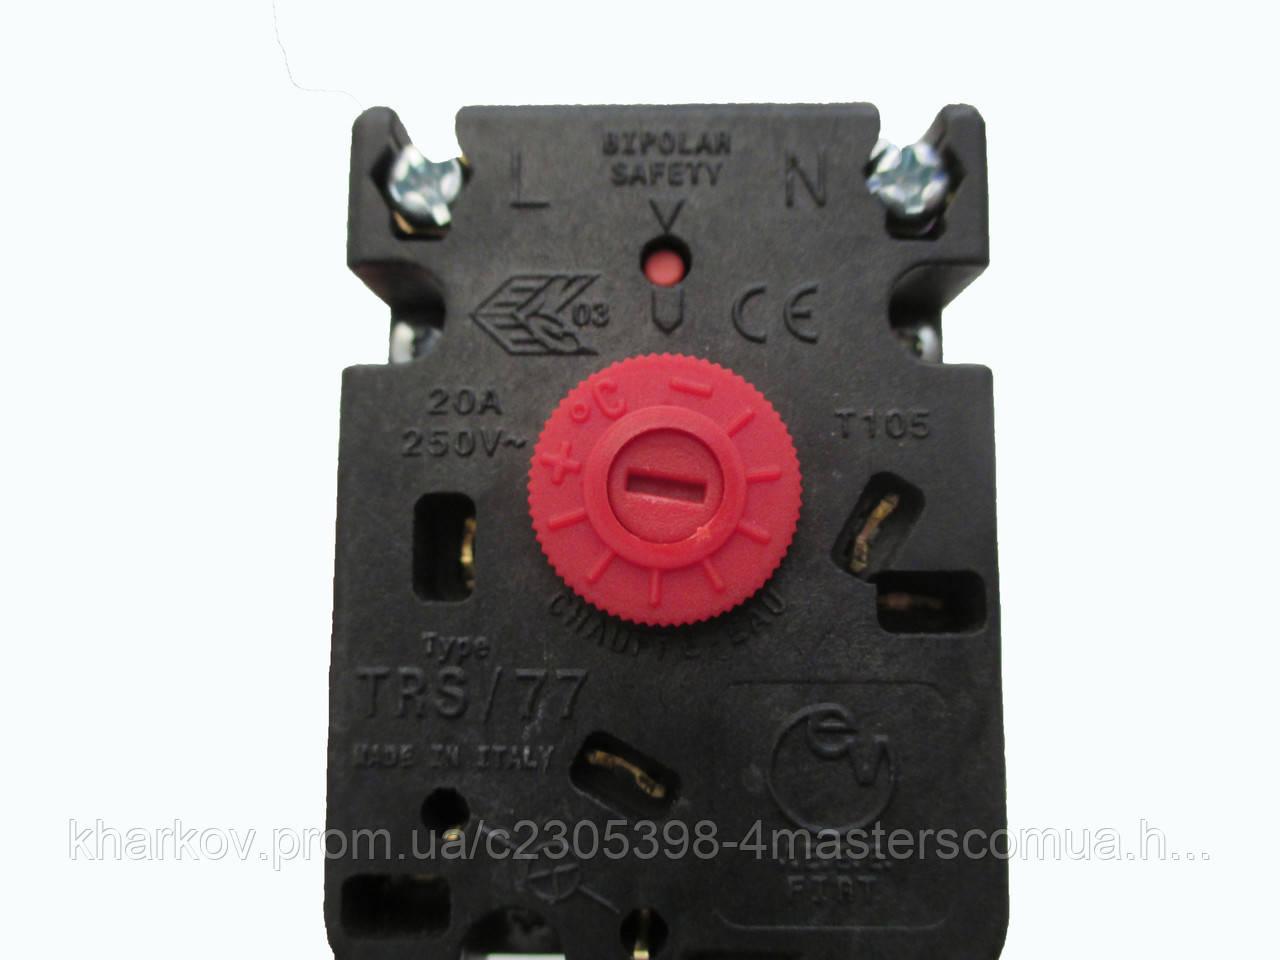 Терморегулятор FIRT 20А, TRS/77